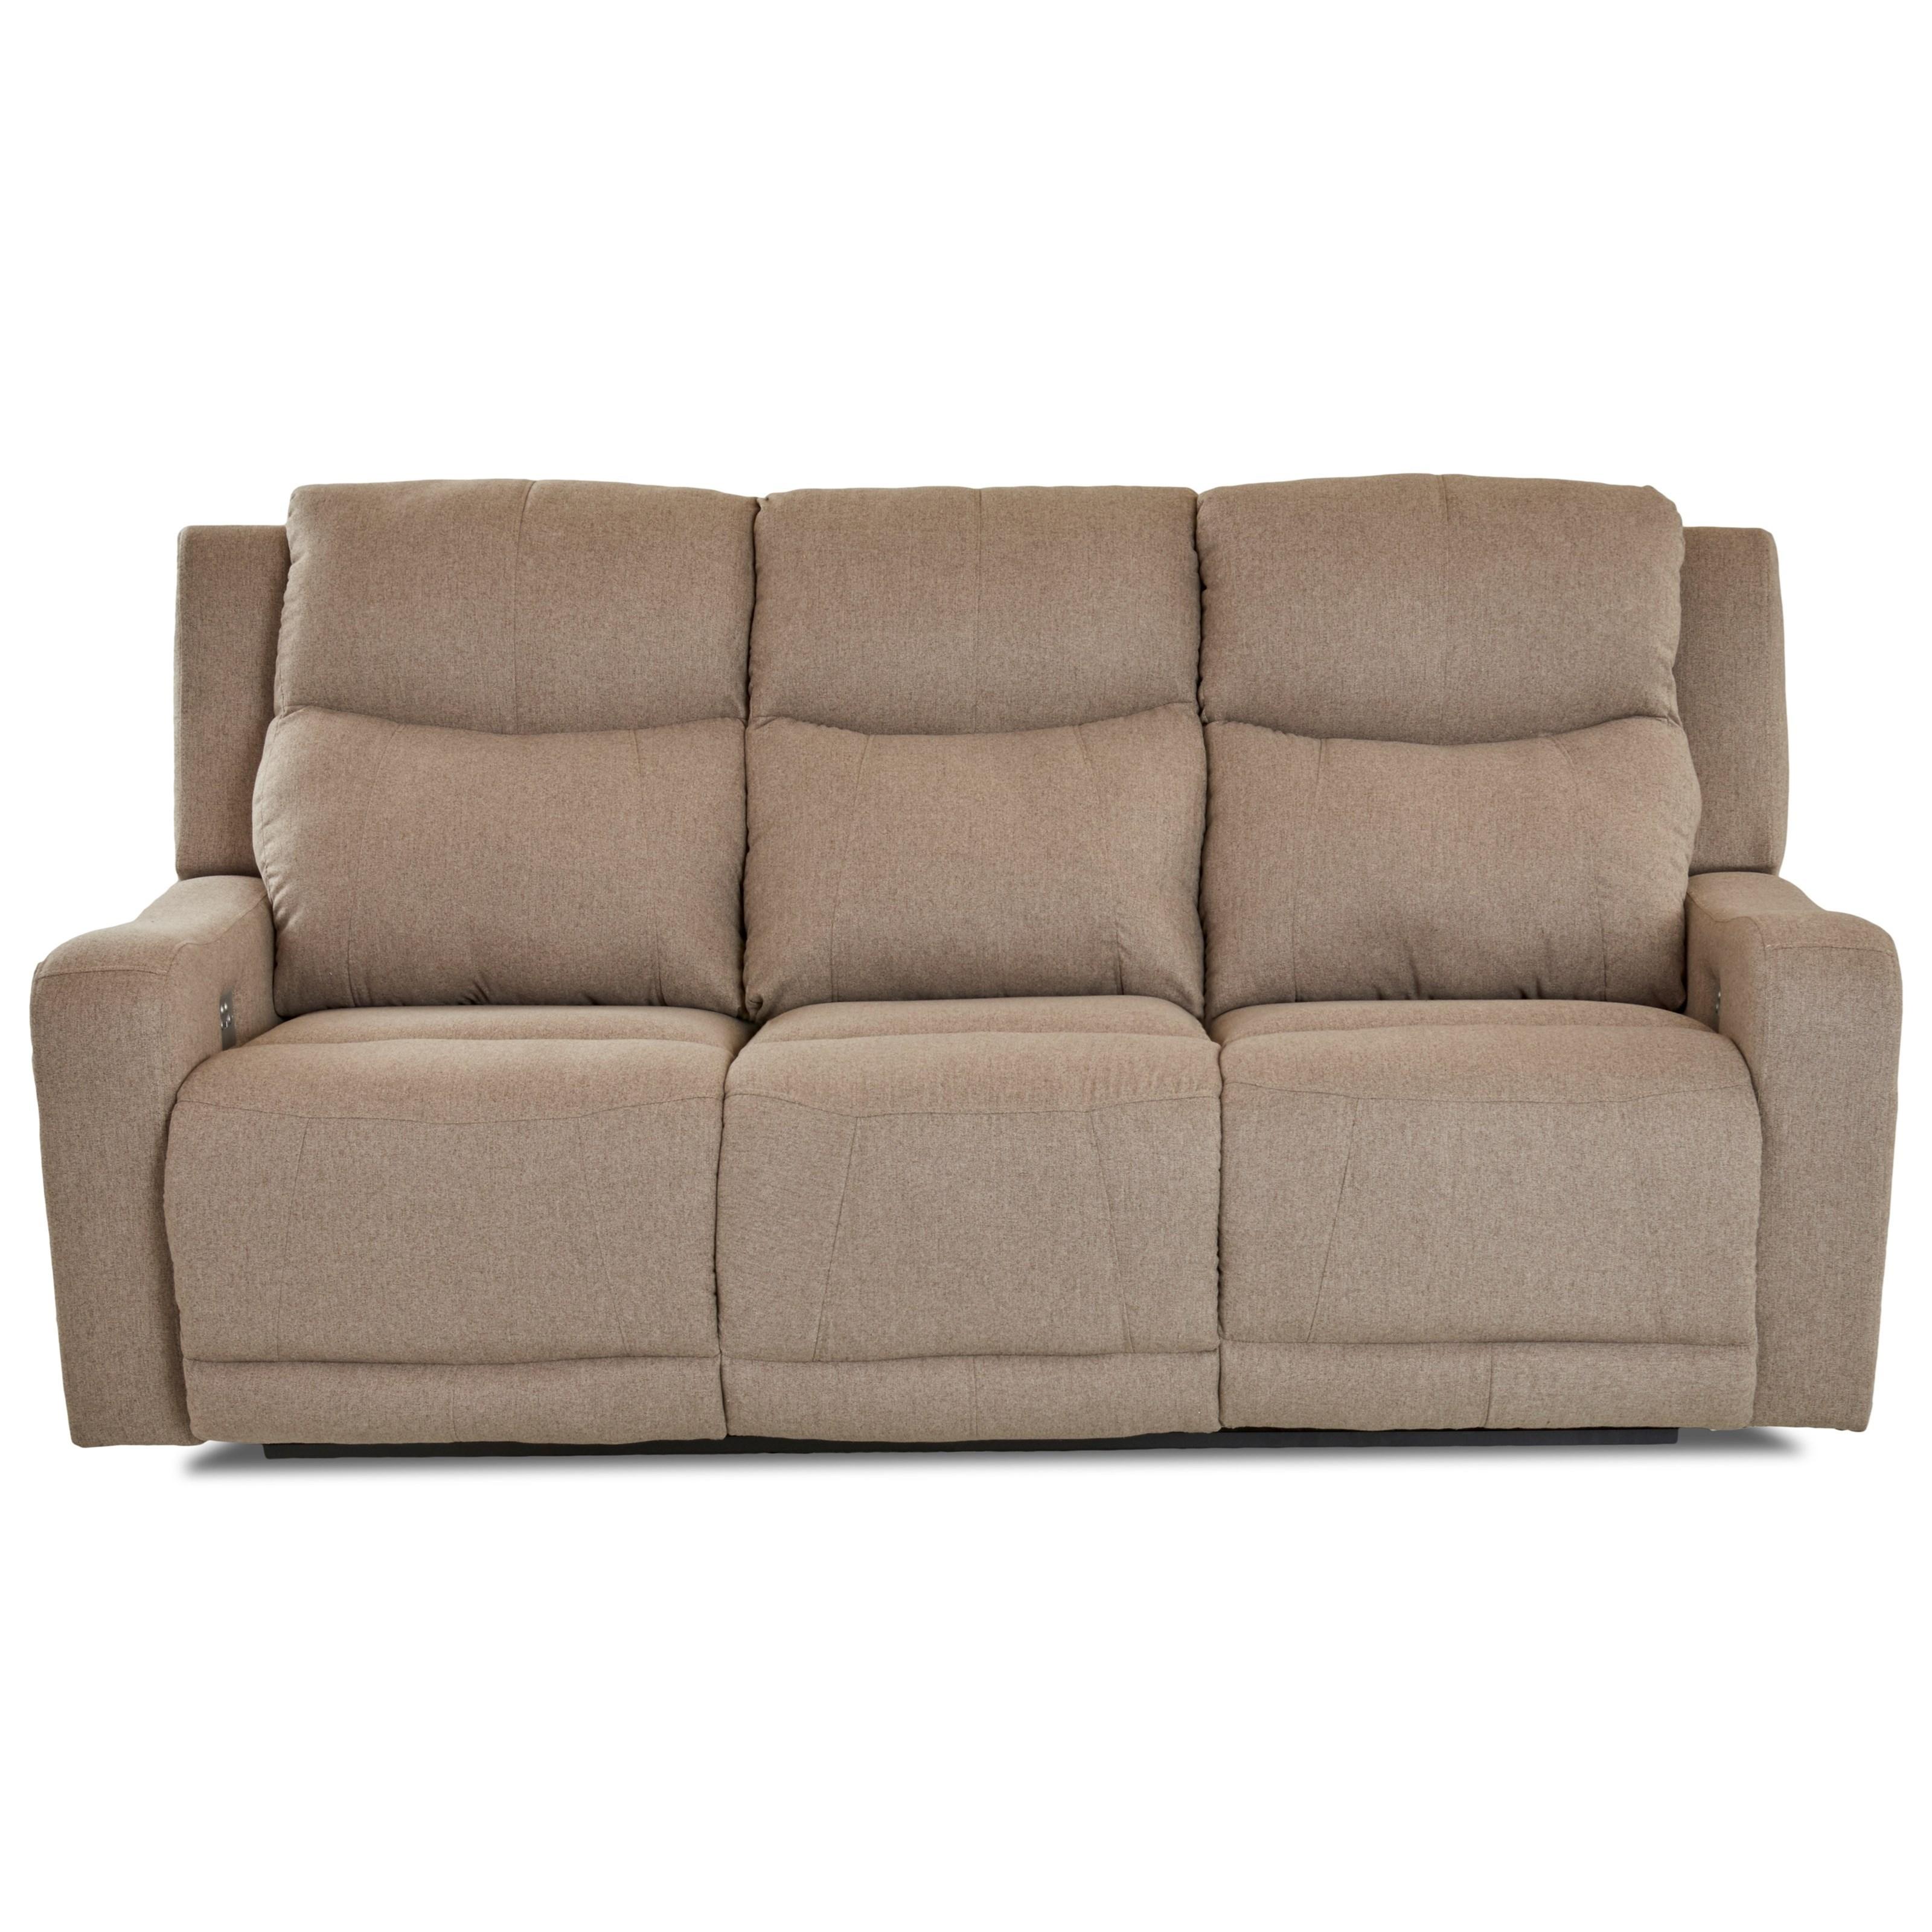 Power Reclining Sofa w/ Pwr Headr and Lumbar